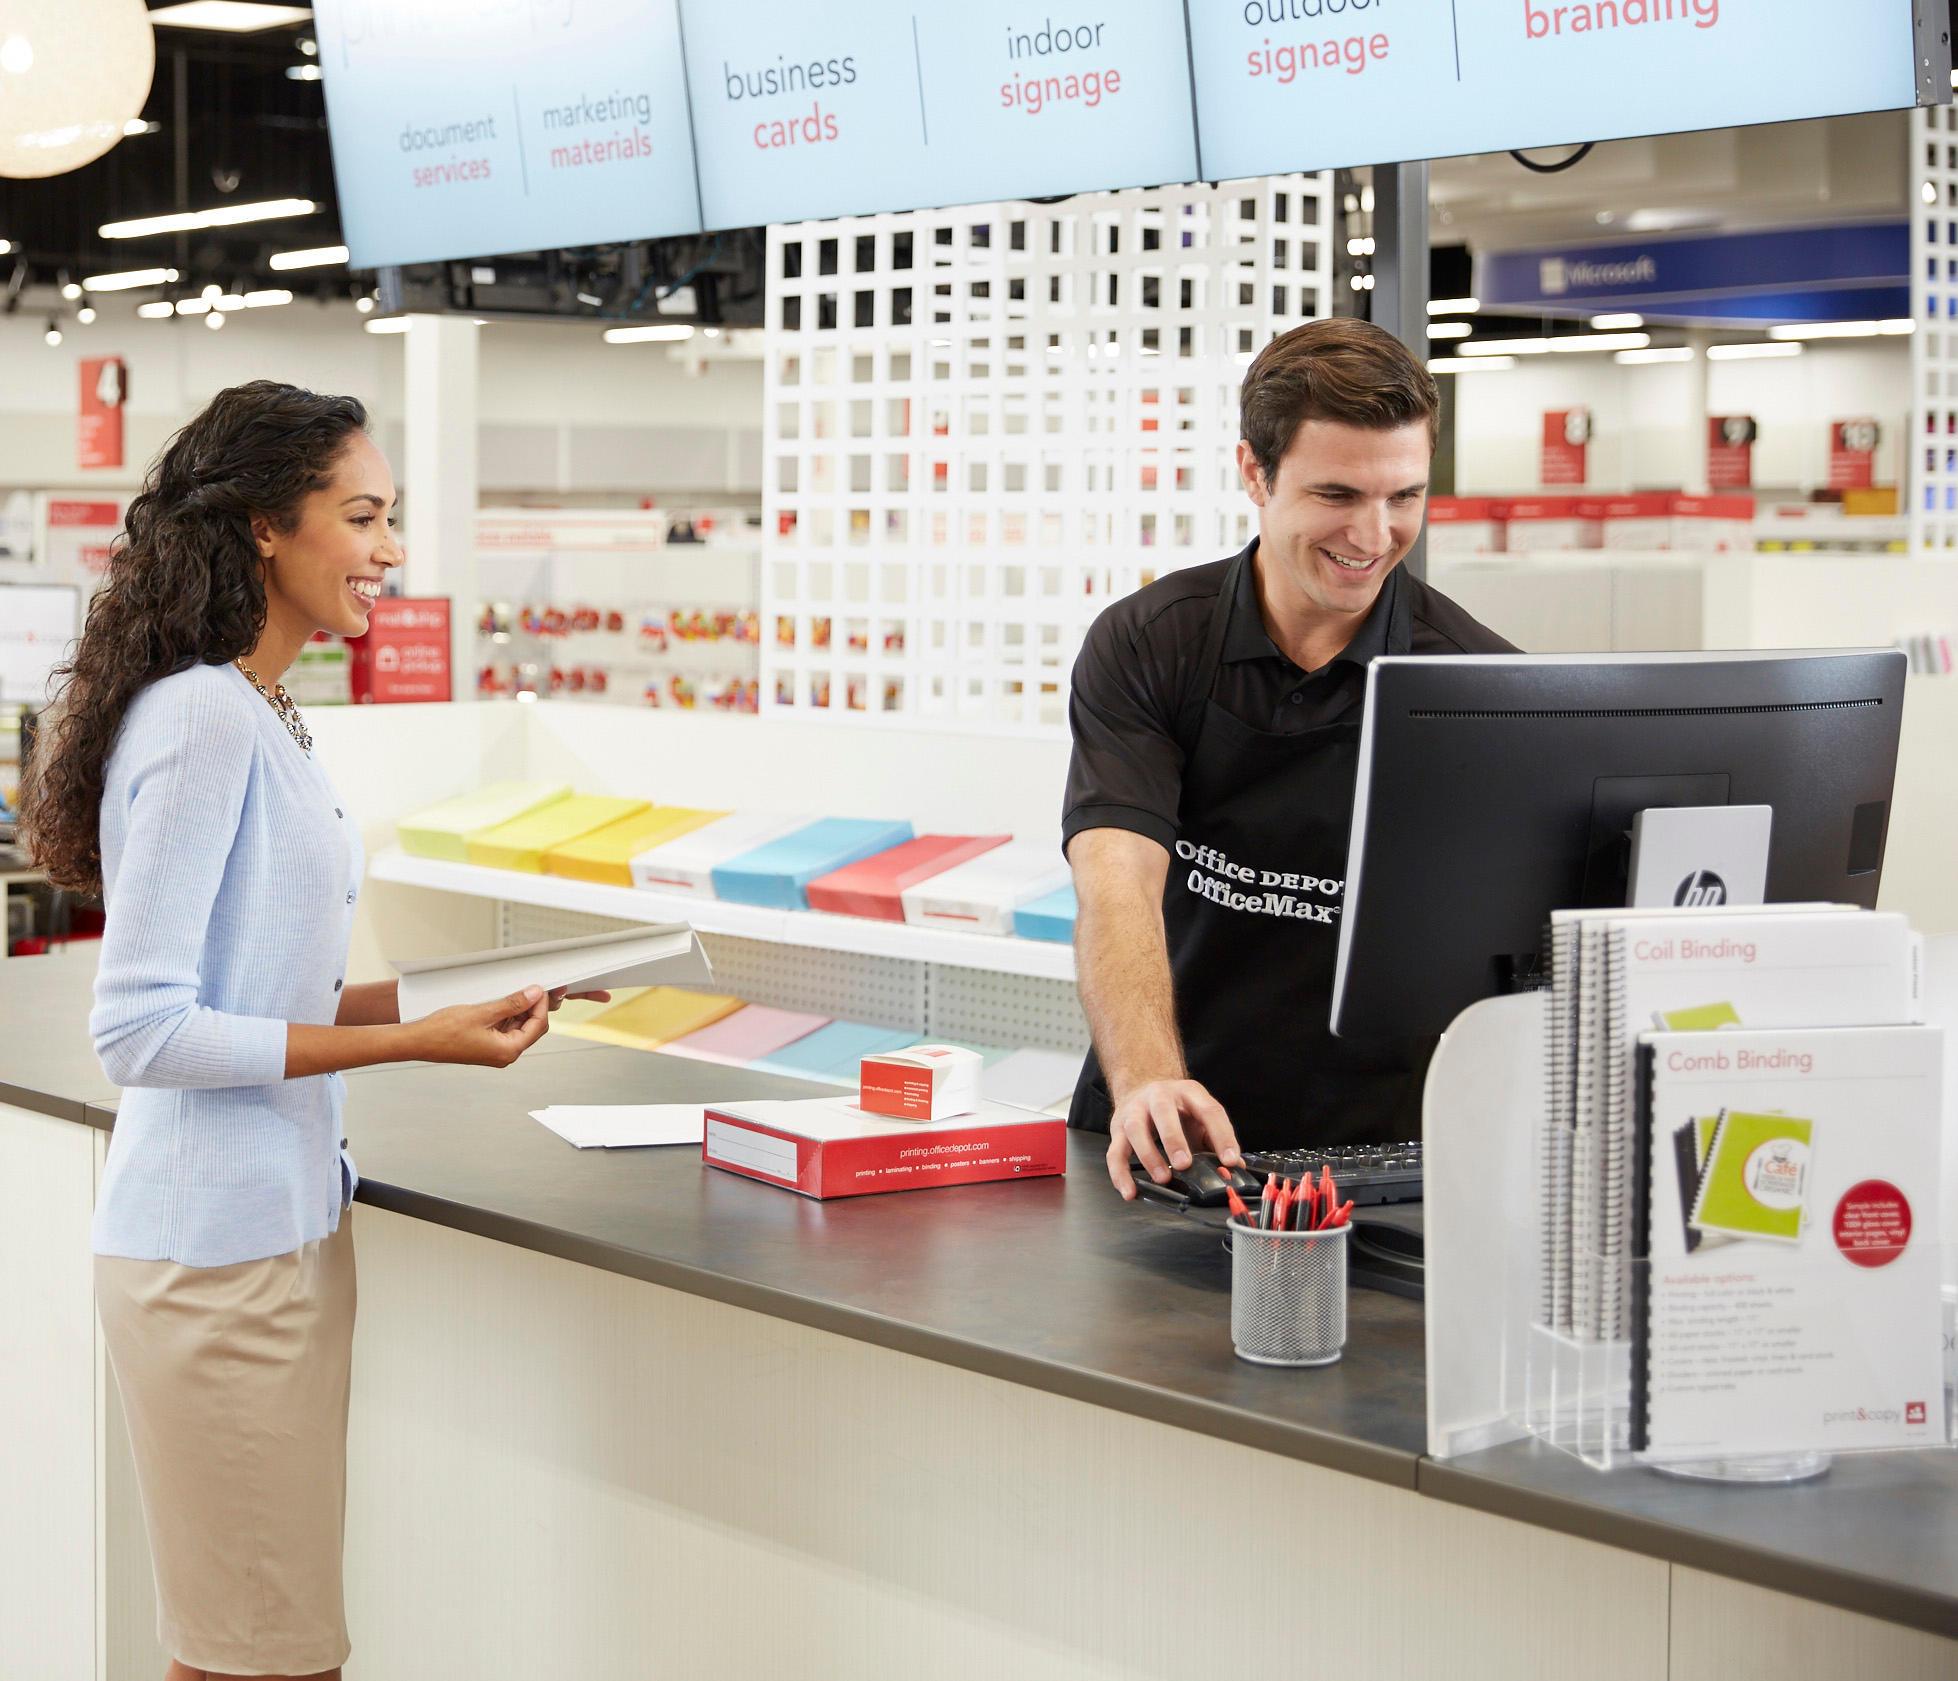 Genial OfficeMax   Print U0026 Copy Services 4484 Jimmy Lee Smith Pkwy, Hiram, GA  30141   YP.com